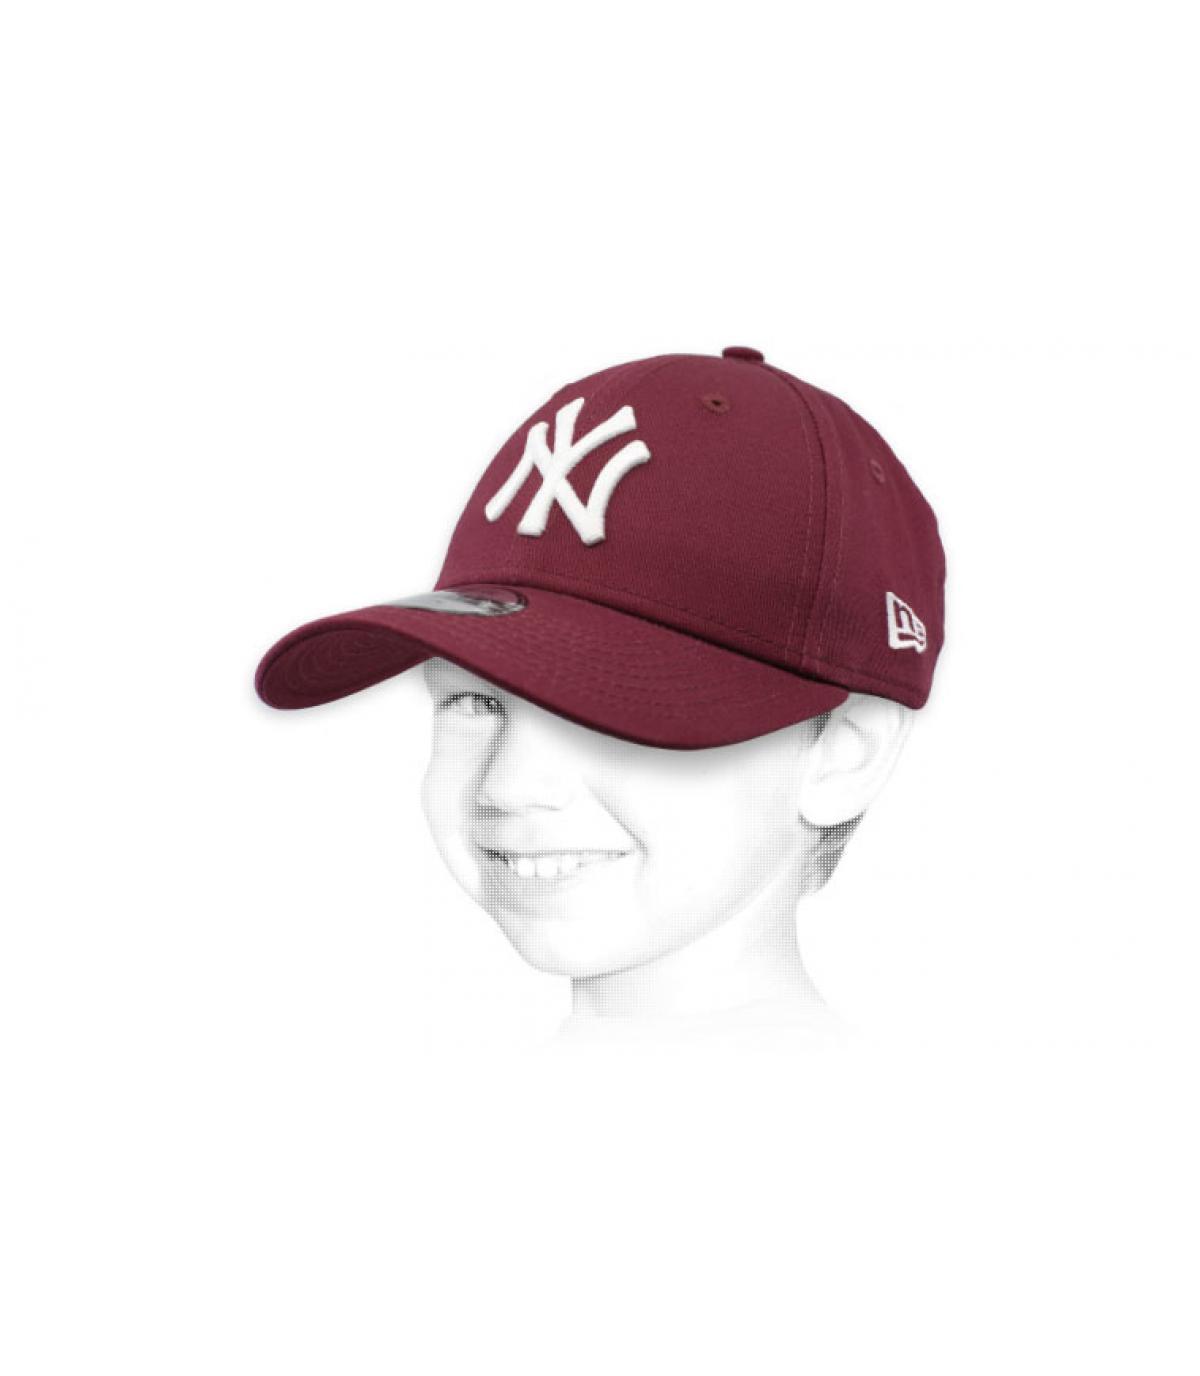 gorra infantil NY morado